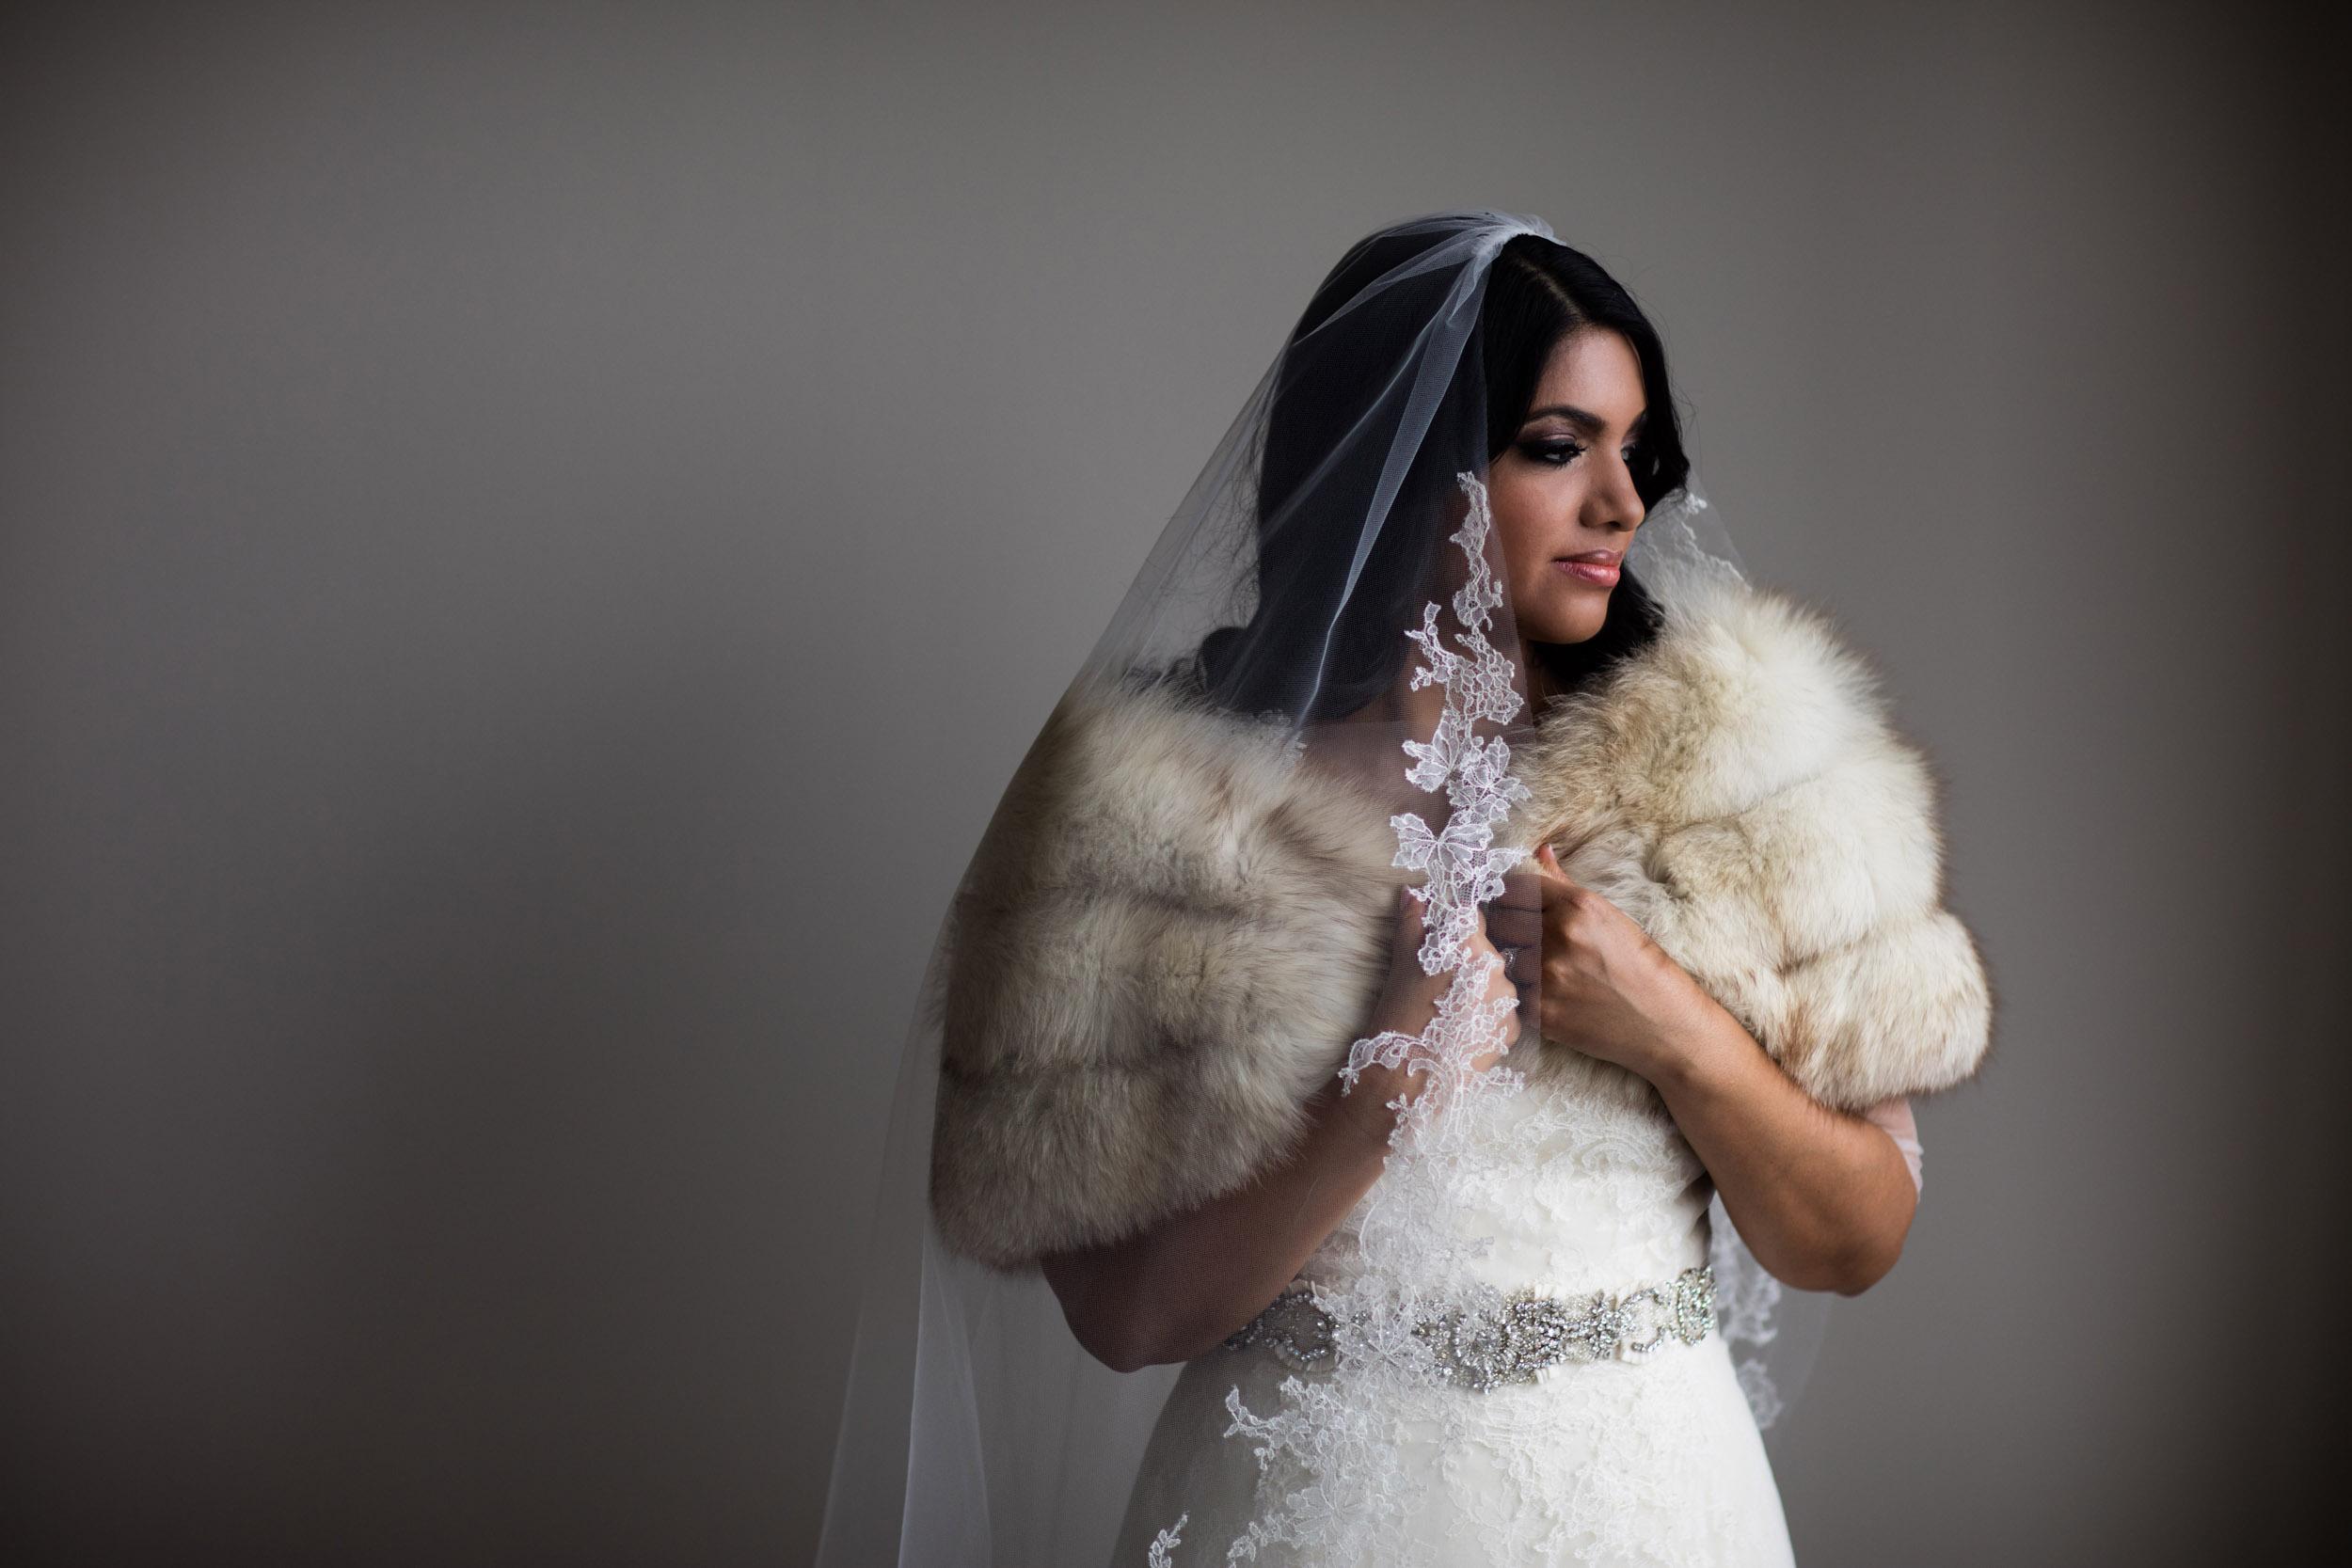 Bridal portrait at Ritz Carlton Chicago